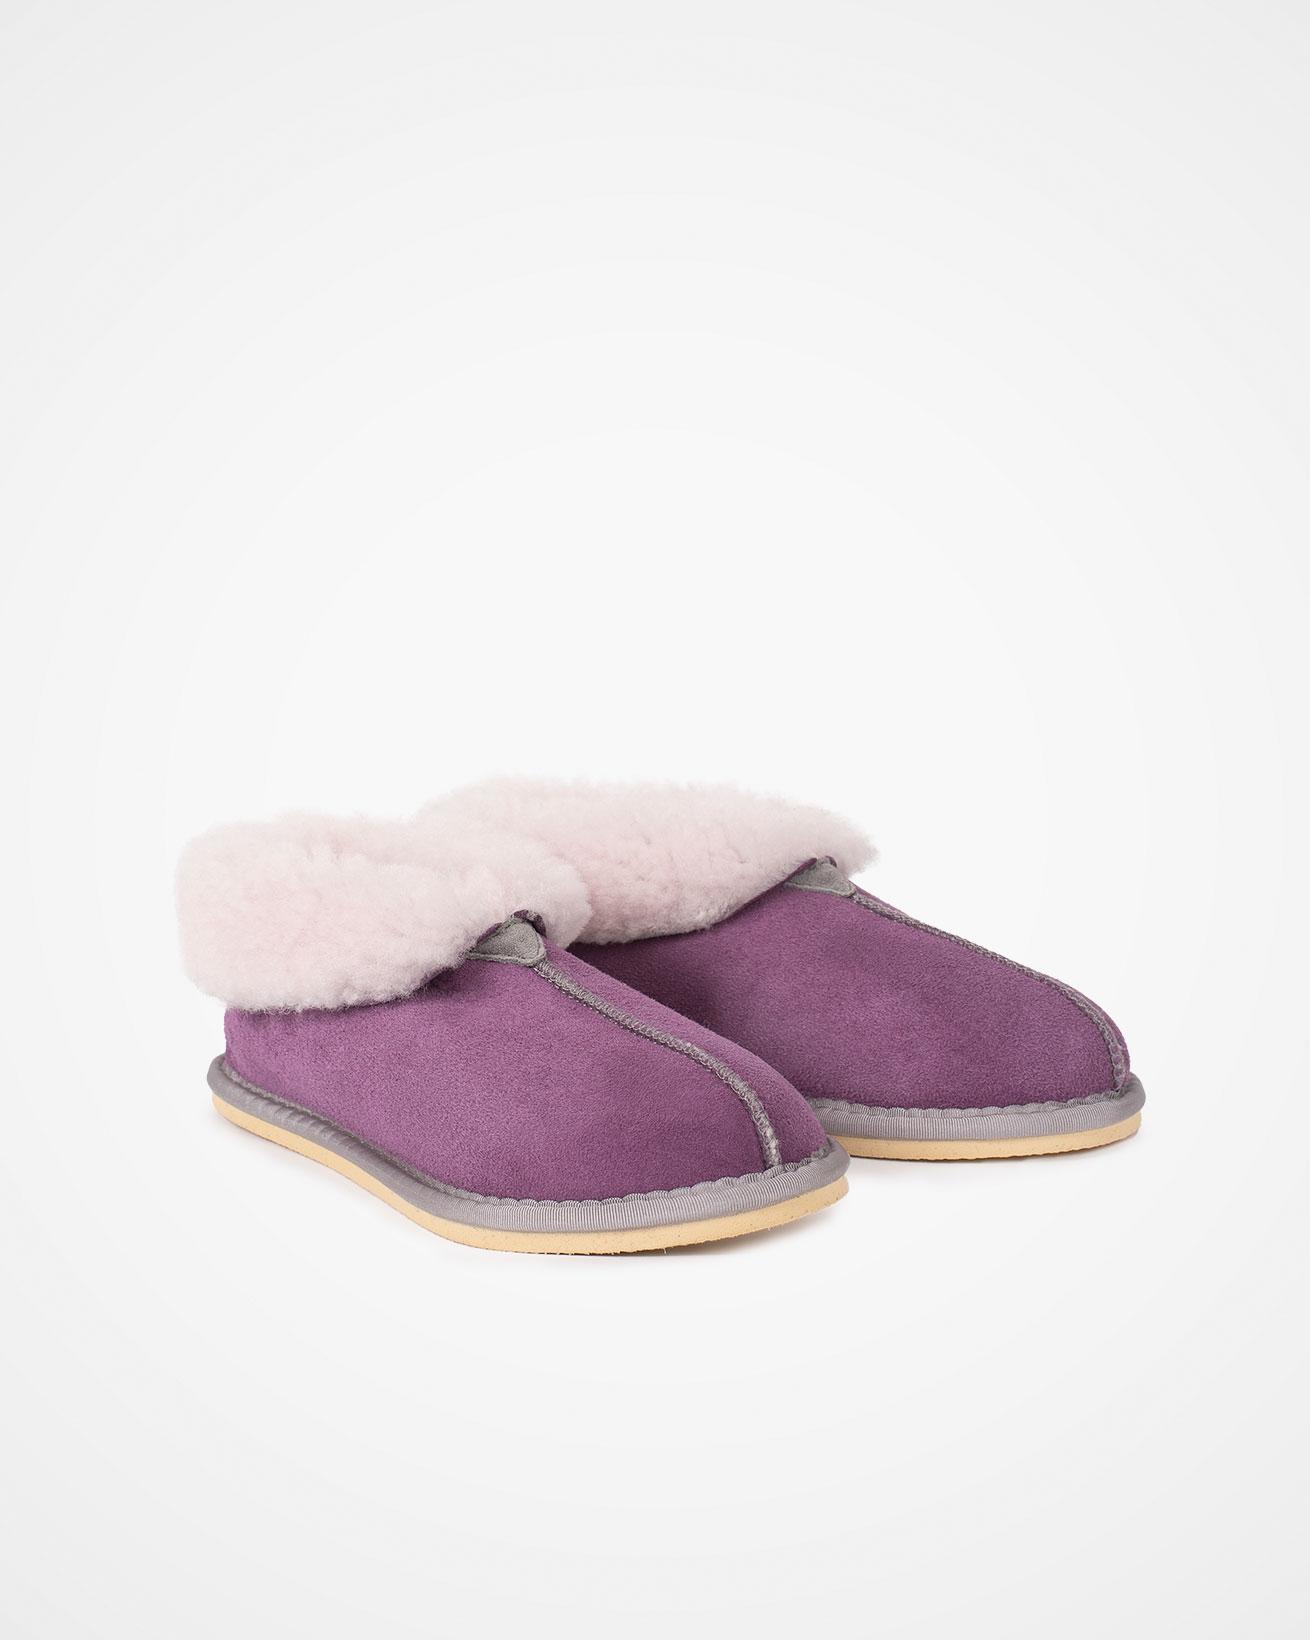 2100_bootee-slippers_anaemone_pair.jpg